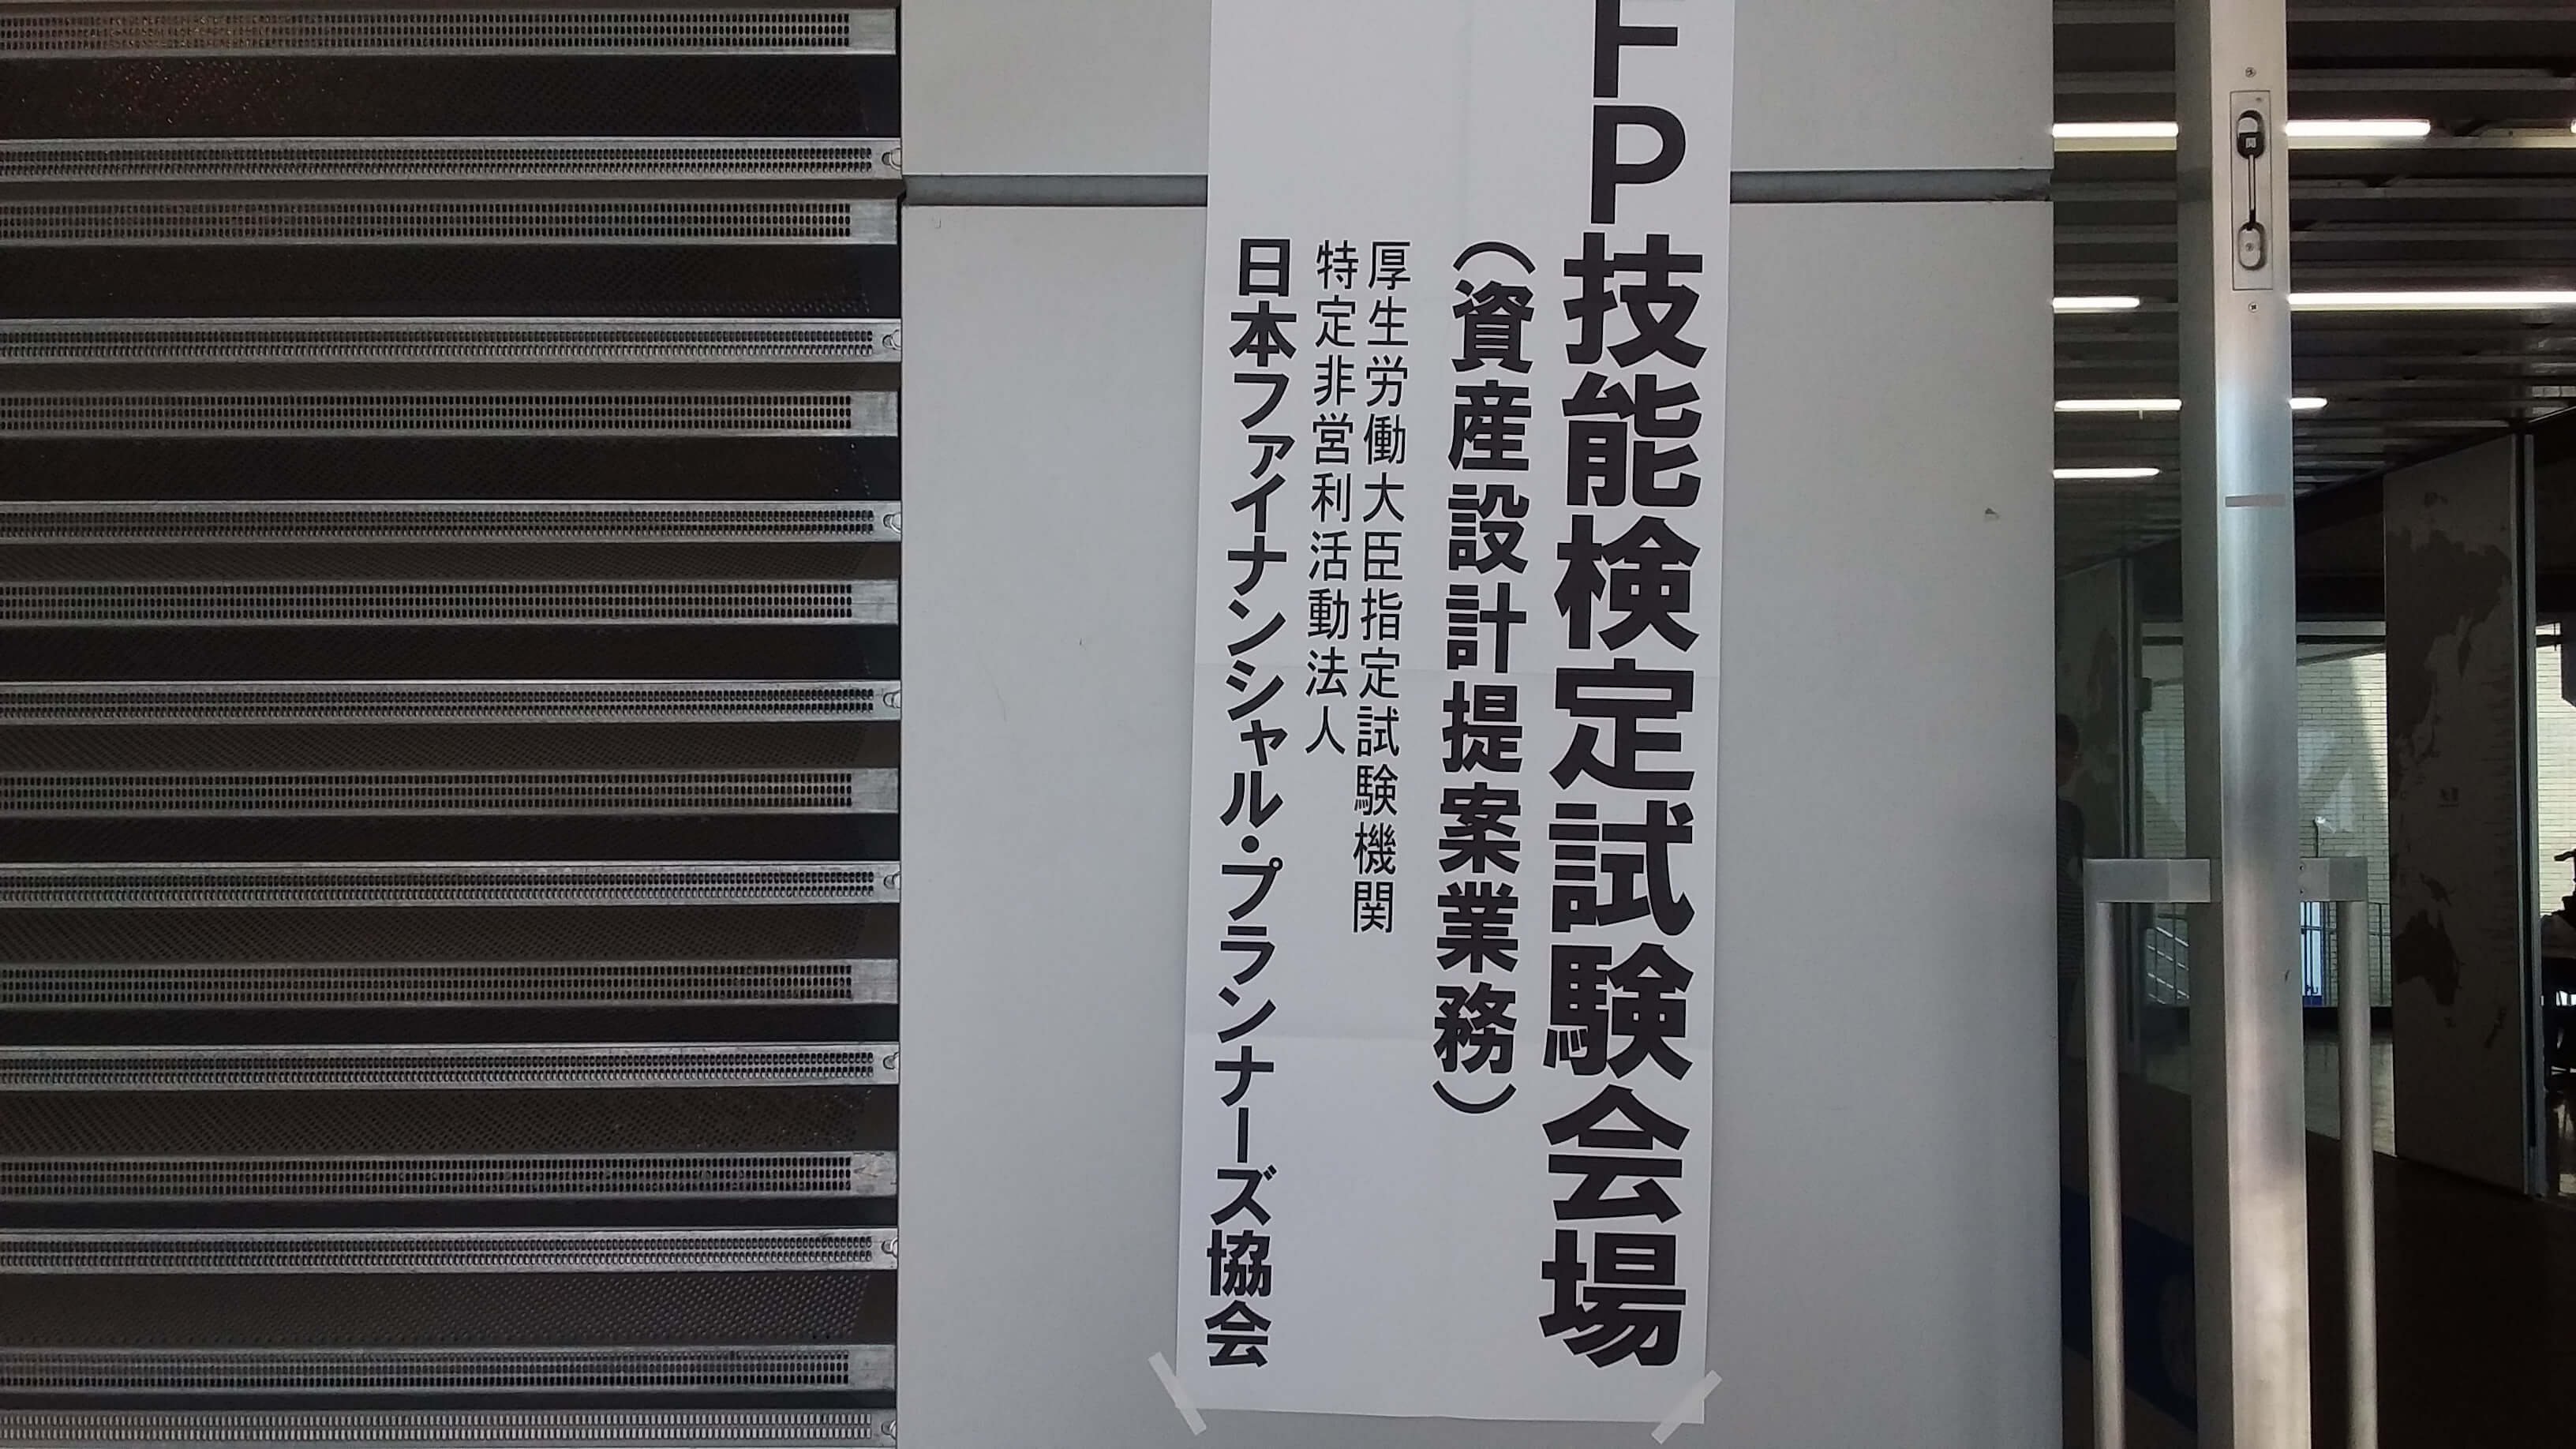 【FP3級】3回目の受験!15時間の勉強で今度こそリベンジ出来るのか!?